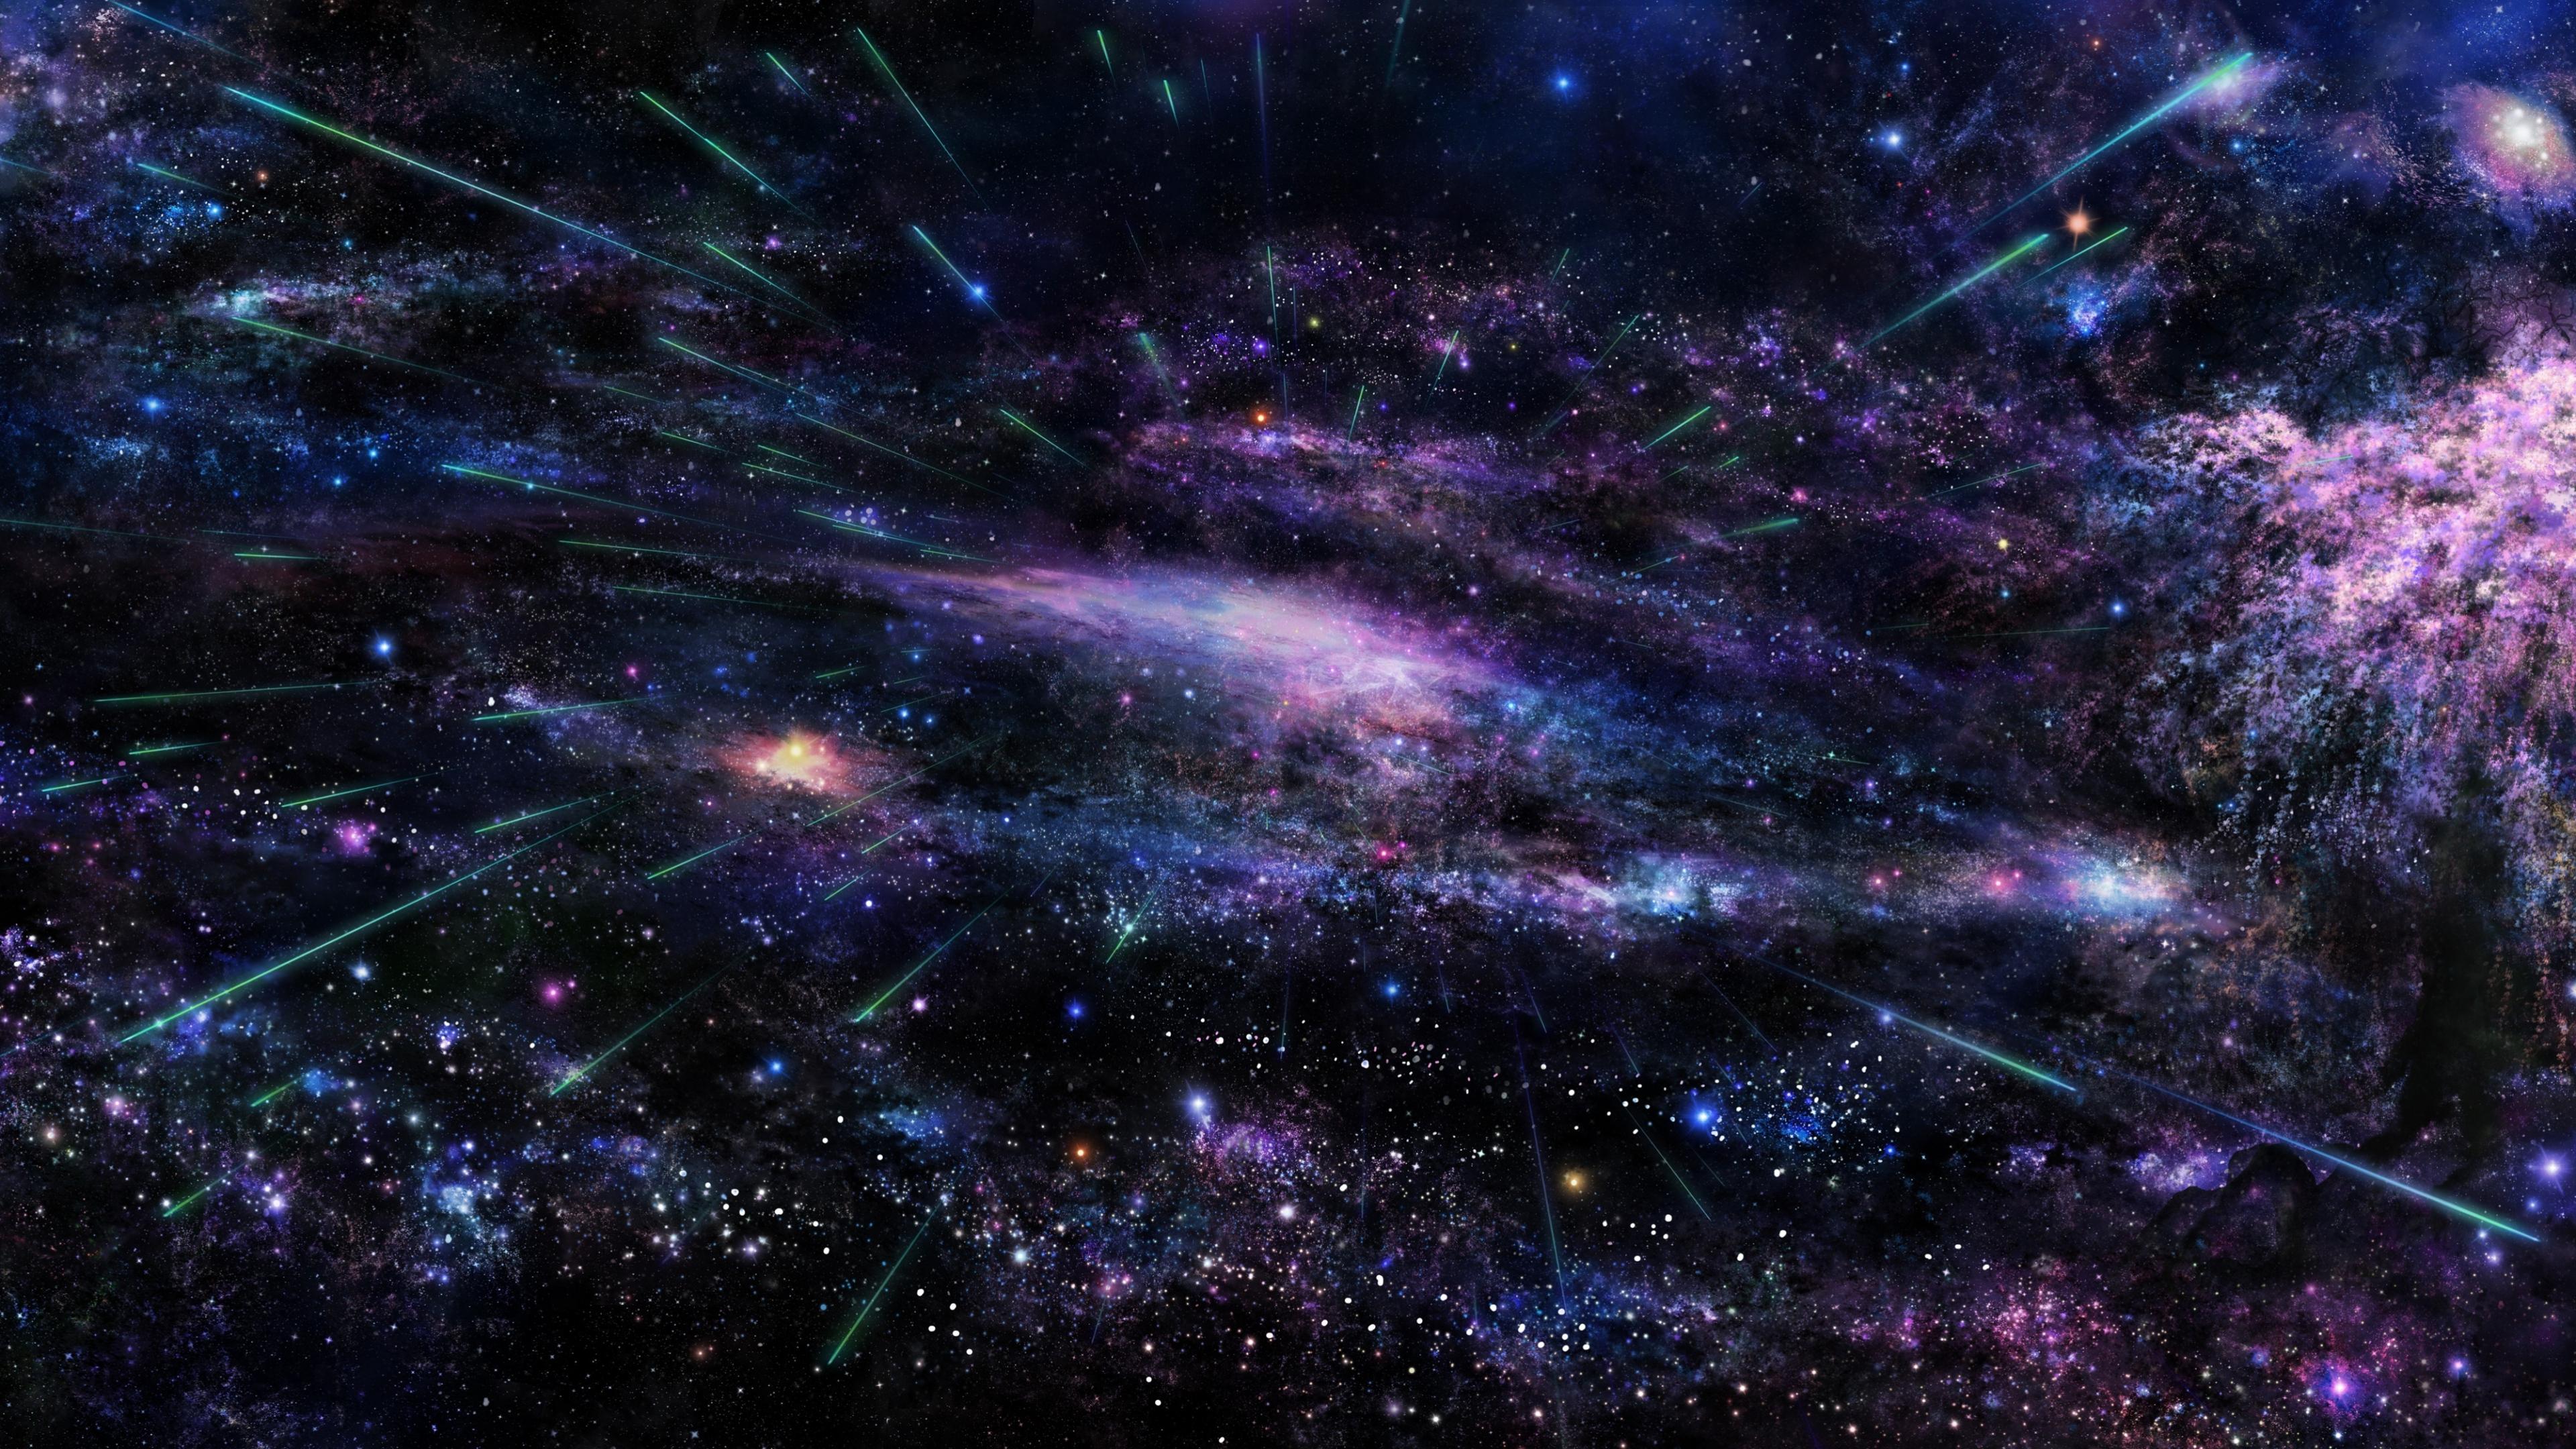 4k universe wallpapers wallpapersafari - Background images 4k hd ...